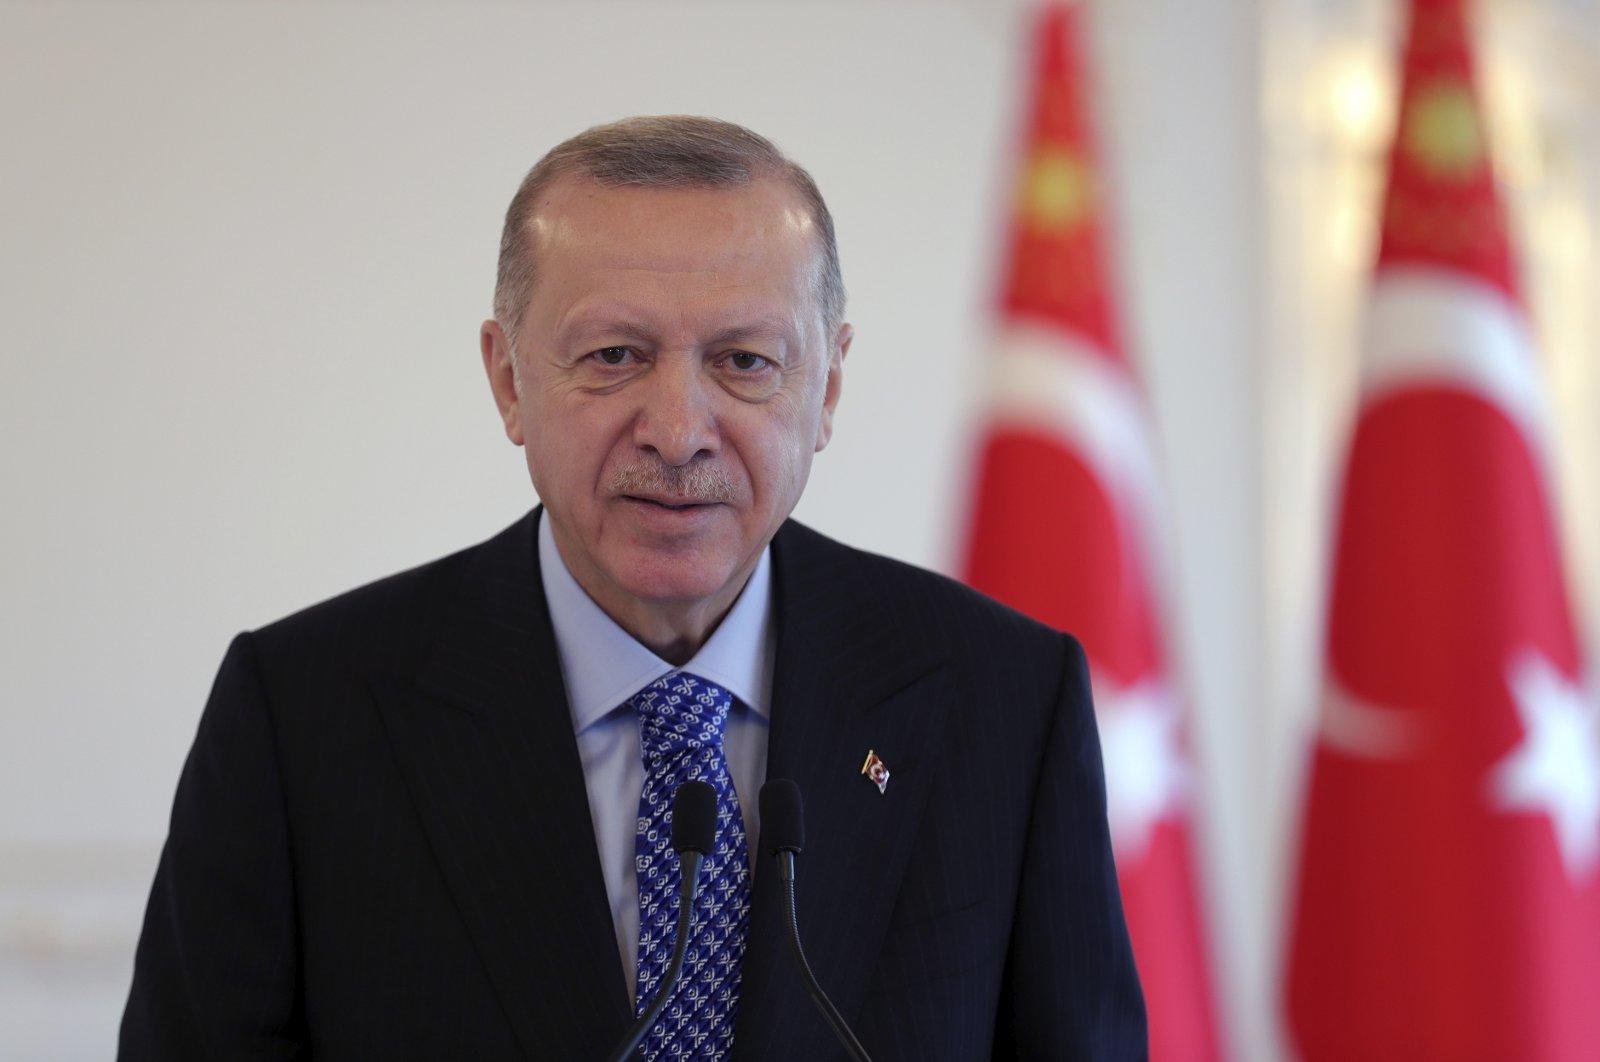 President Recep Tayyip Erdoğan speaks in Istanbul, Turkey, Dec. 5, 2020. (AP Photo)